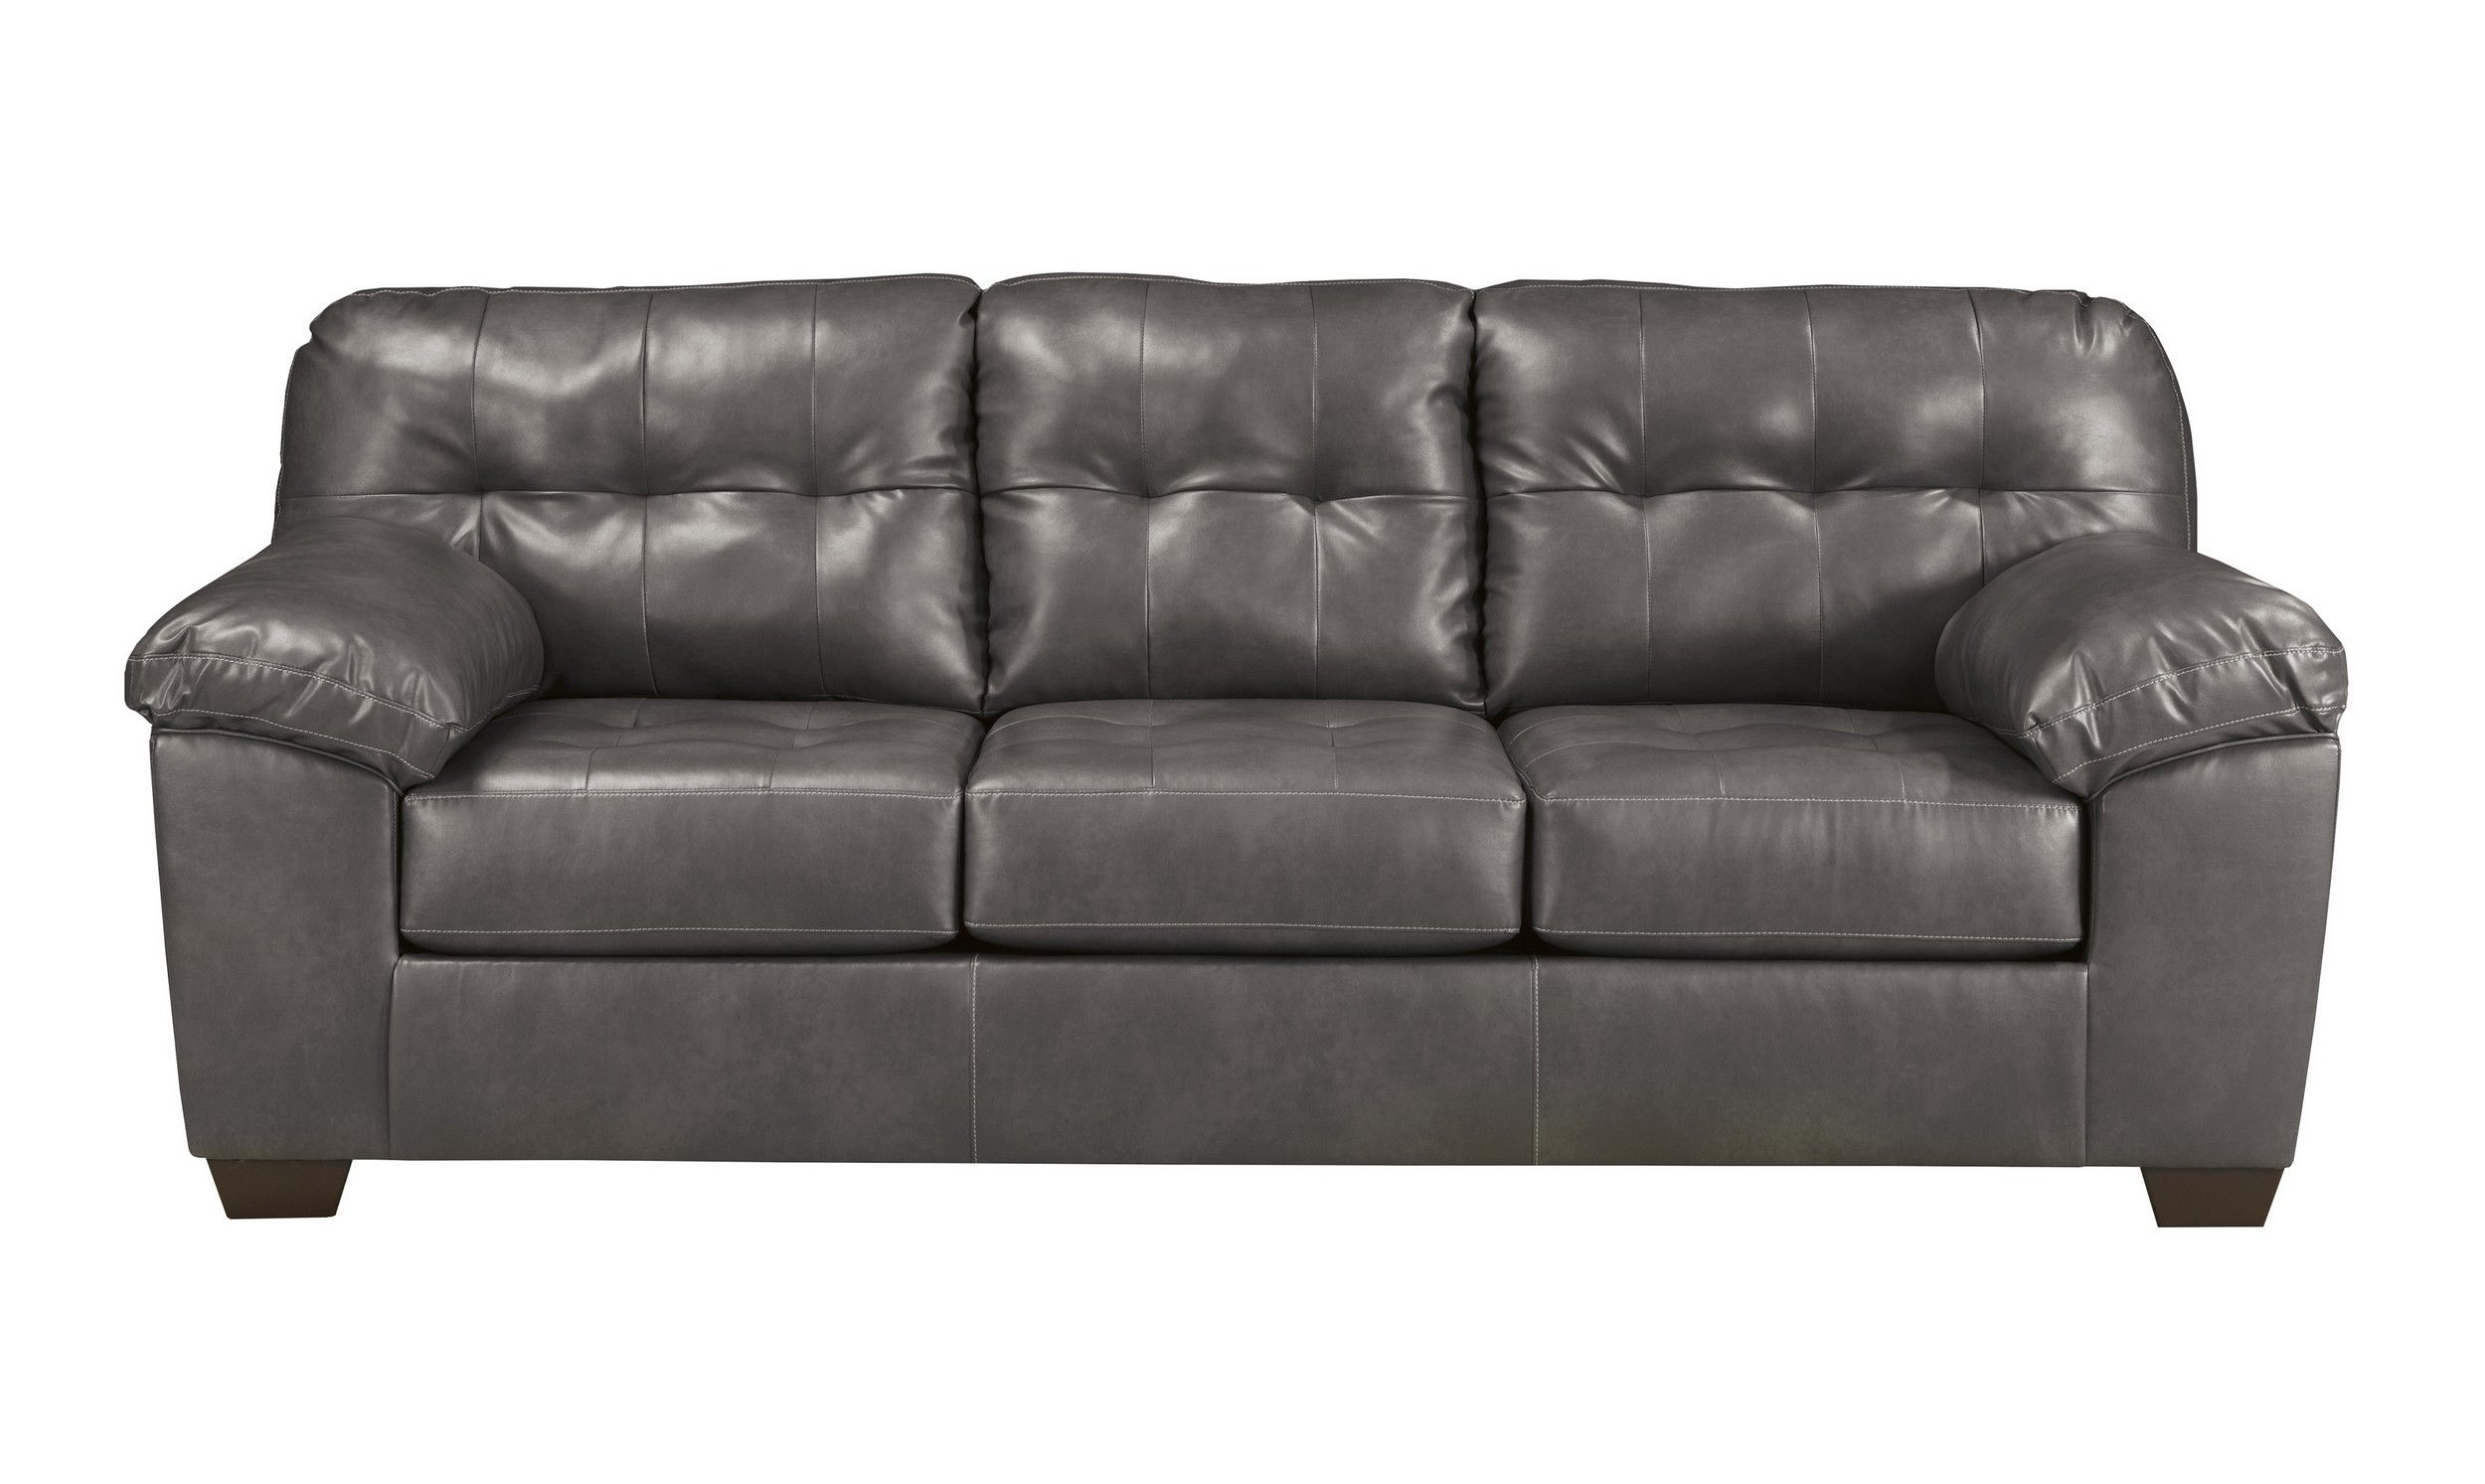 Signature Design By Ashley Alliston Gray Queen Sleeper Sofa Reviews Goedekers Com Leather Sofa Sofa Sofa Deals